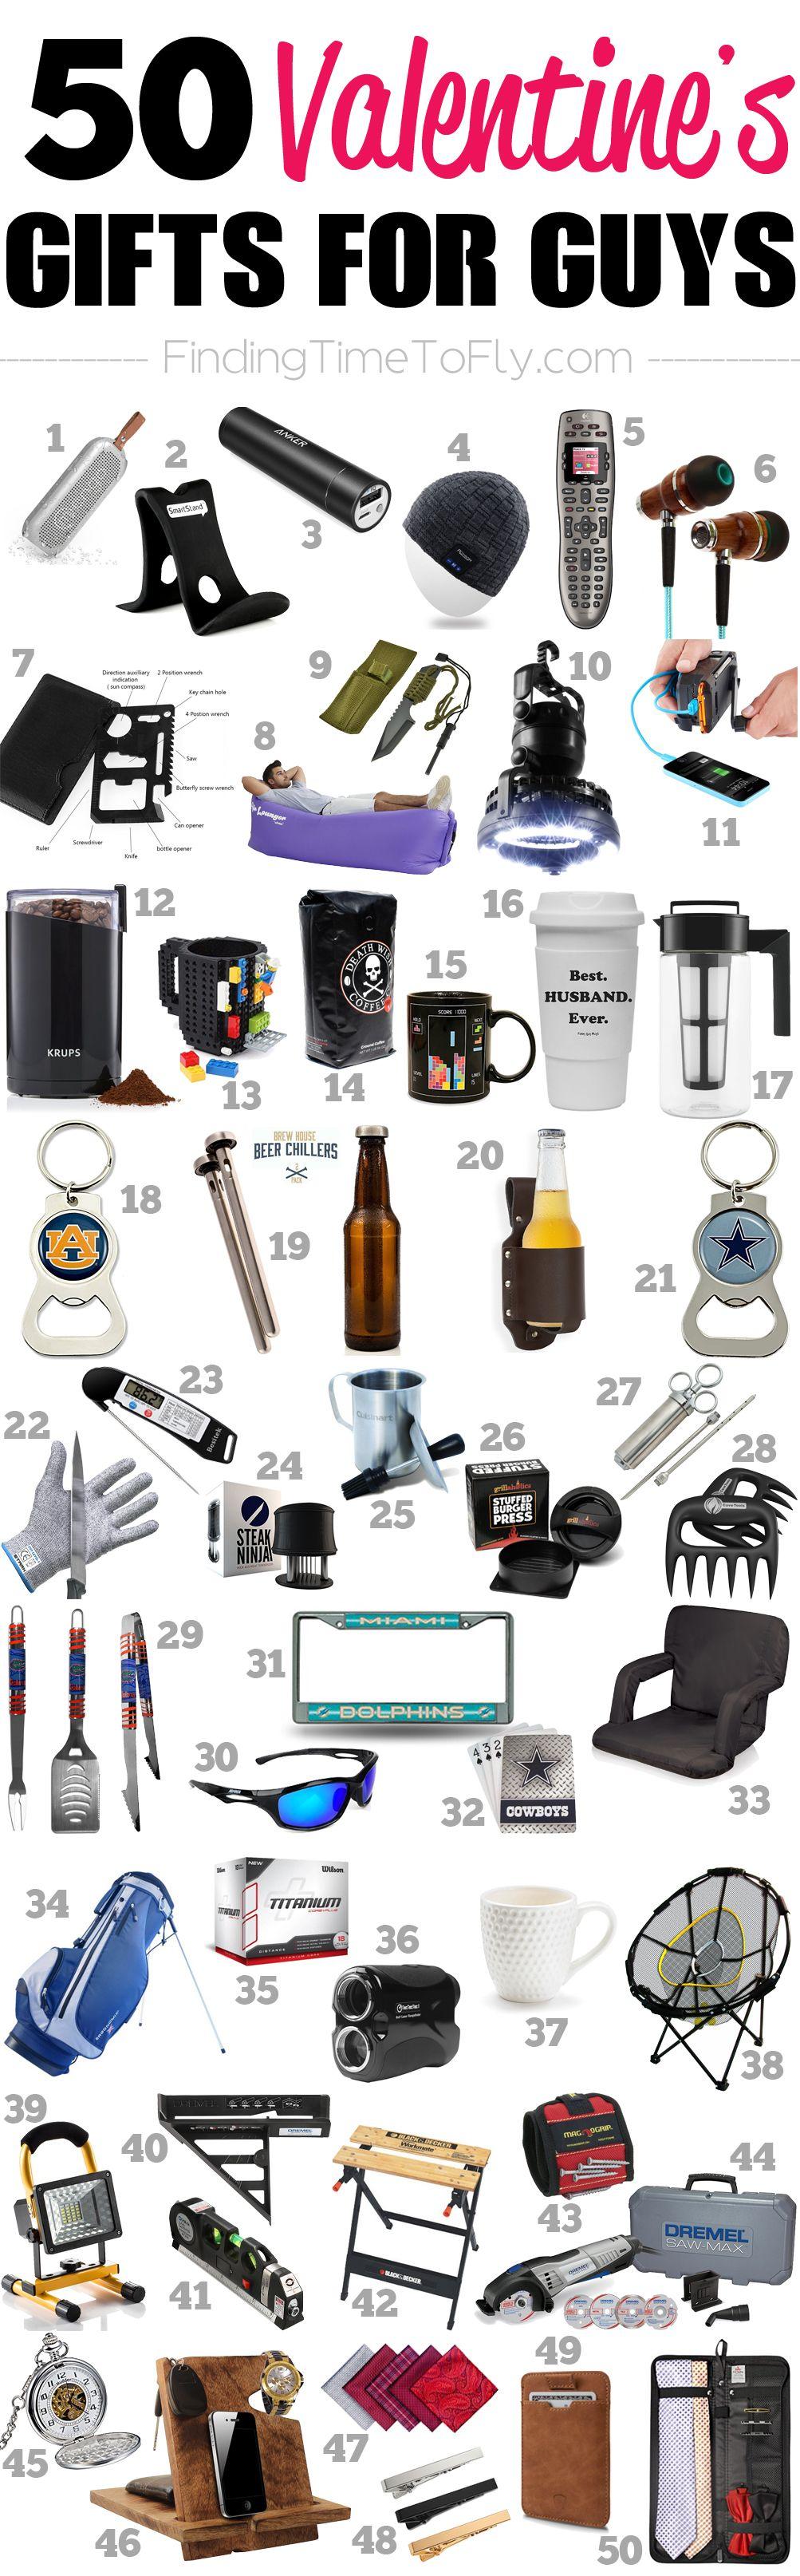 50 Gifts for Guys for Every Occasion | Geschenkideen, Geschenk und ...